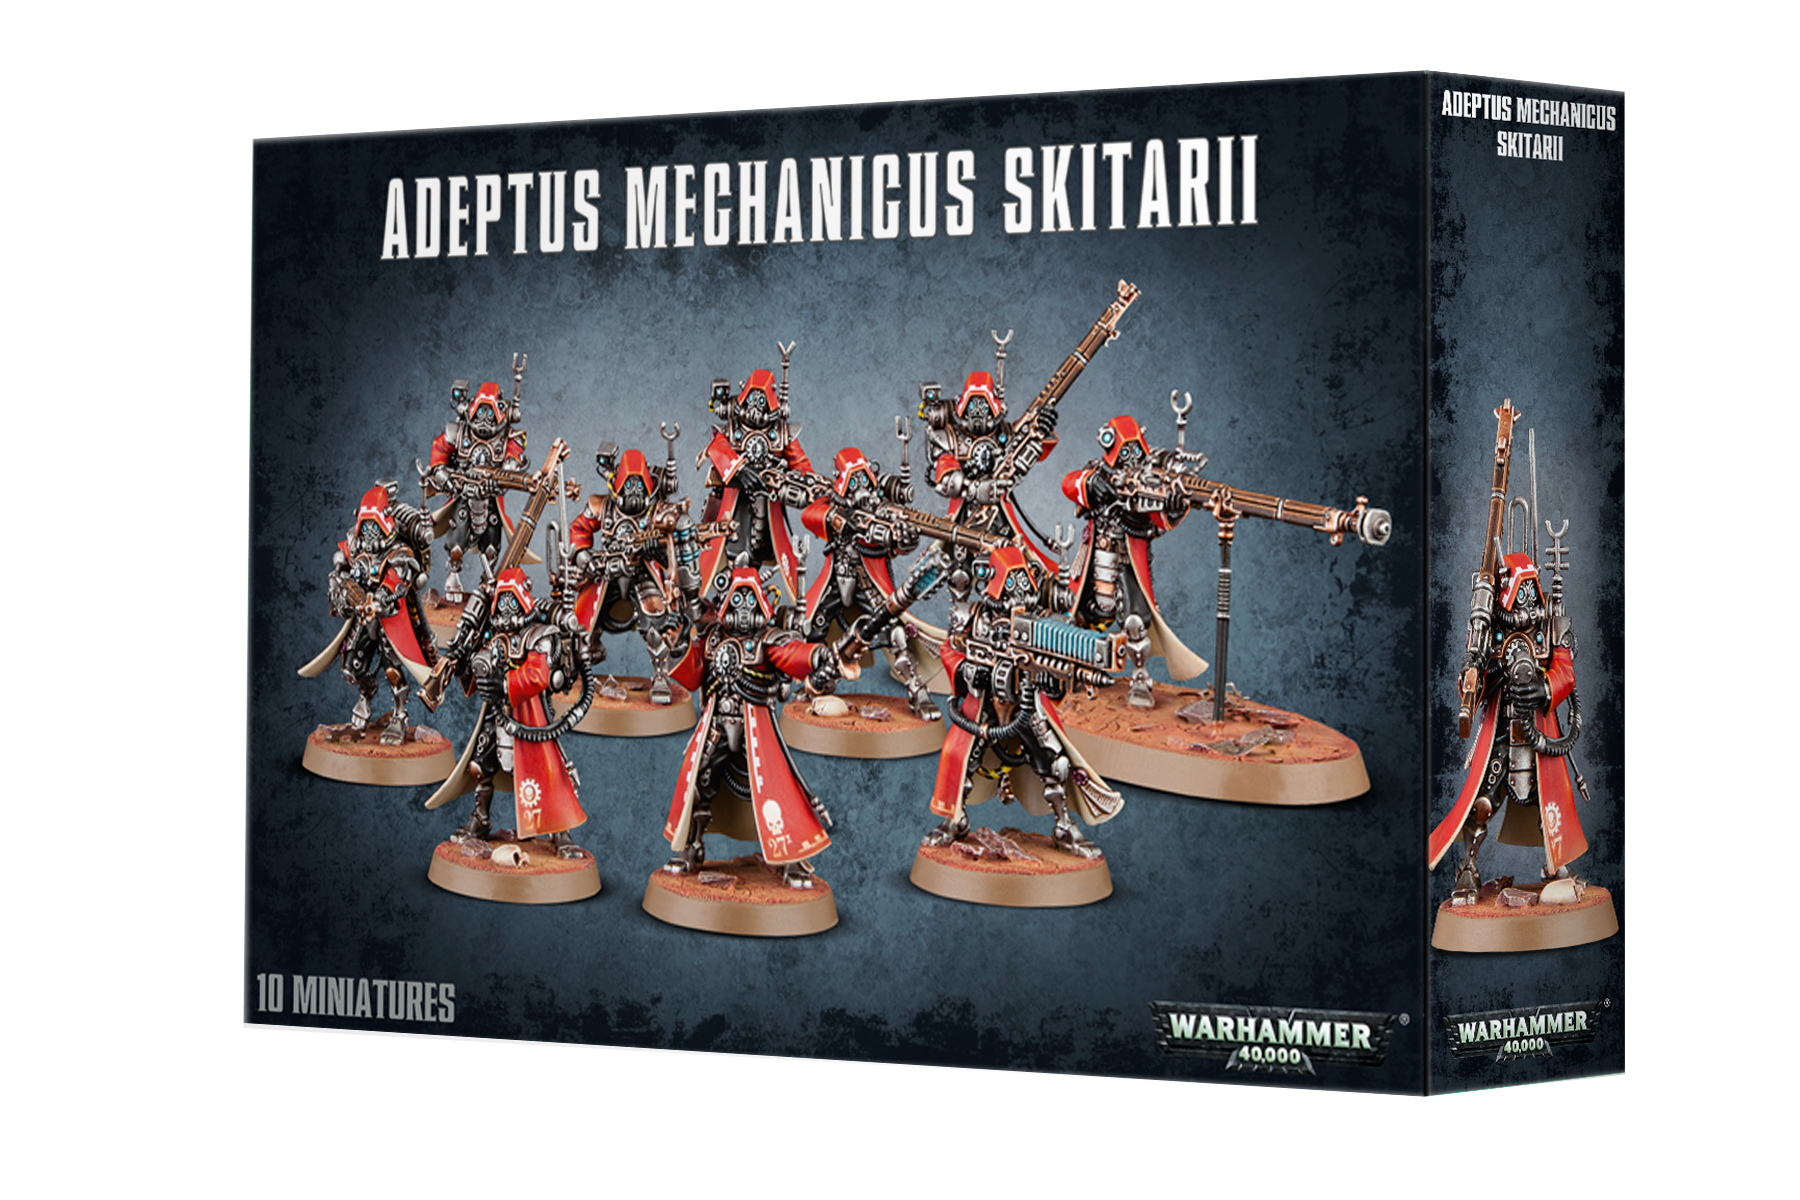 Games-Workshop Adeptus Mechanicus Skitarii